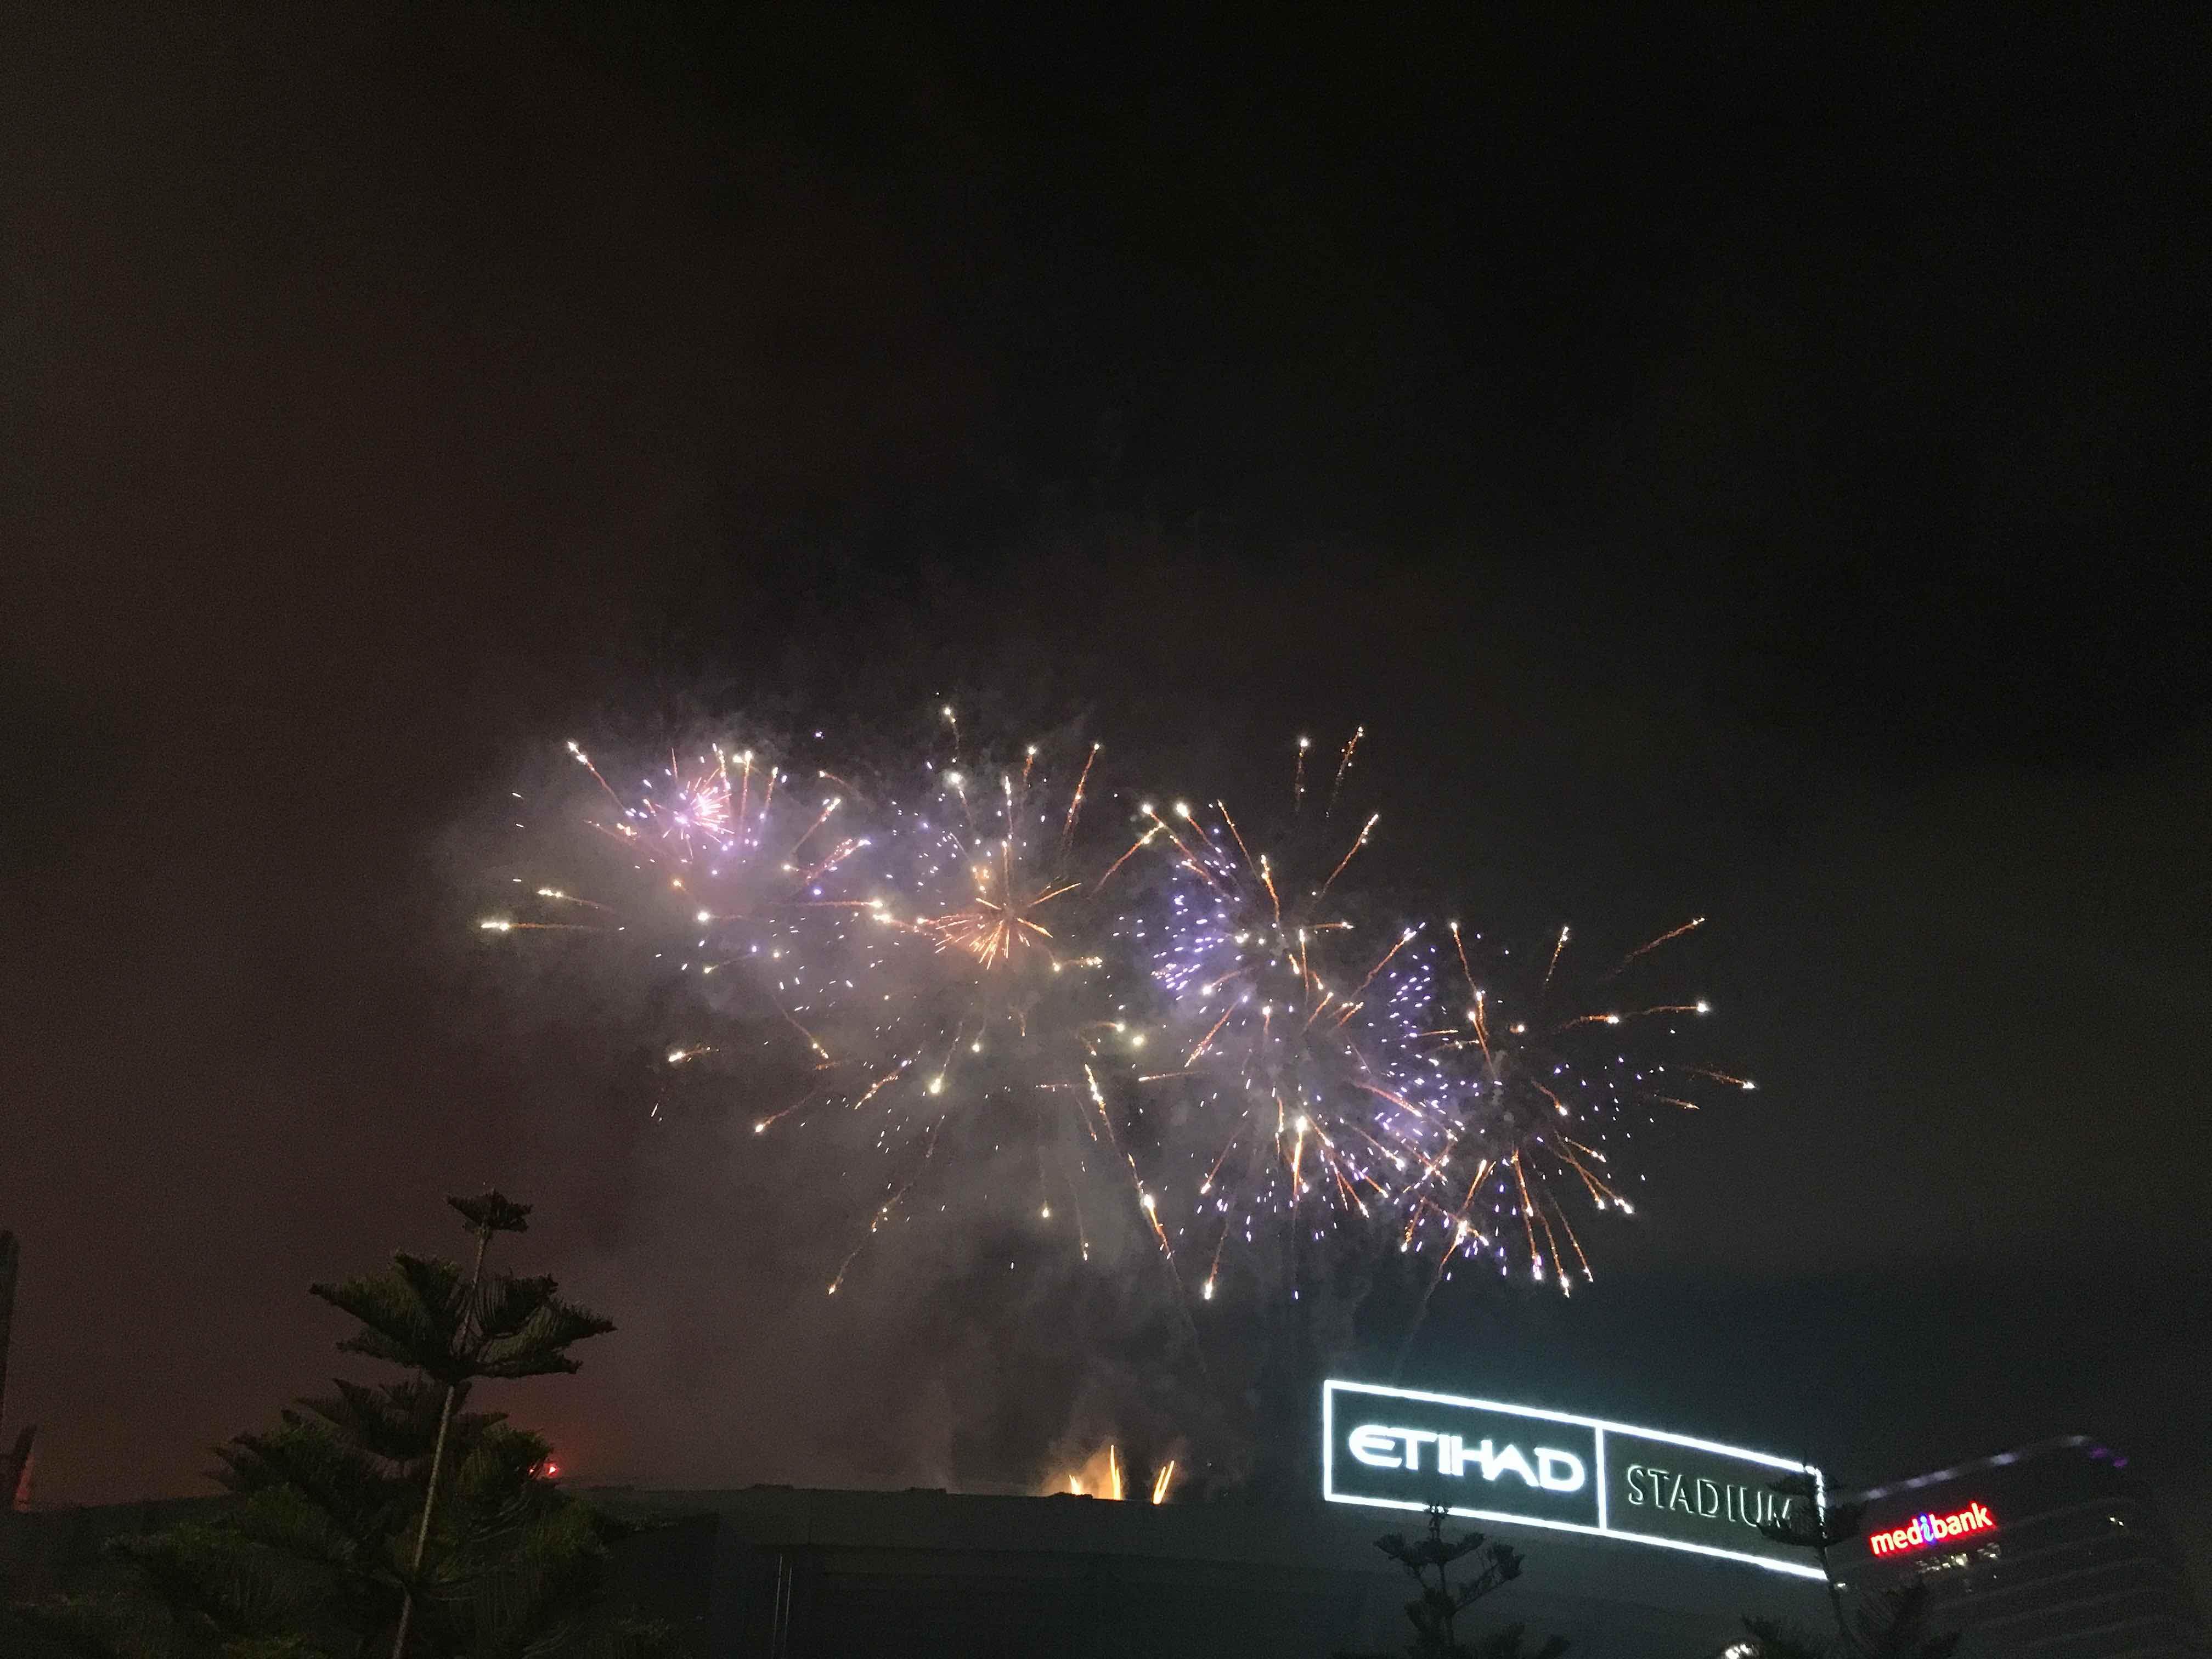 ew Year fireworks 2.jpg